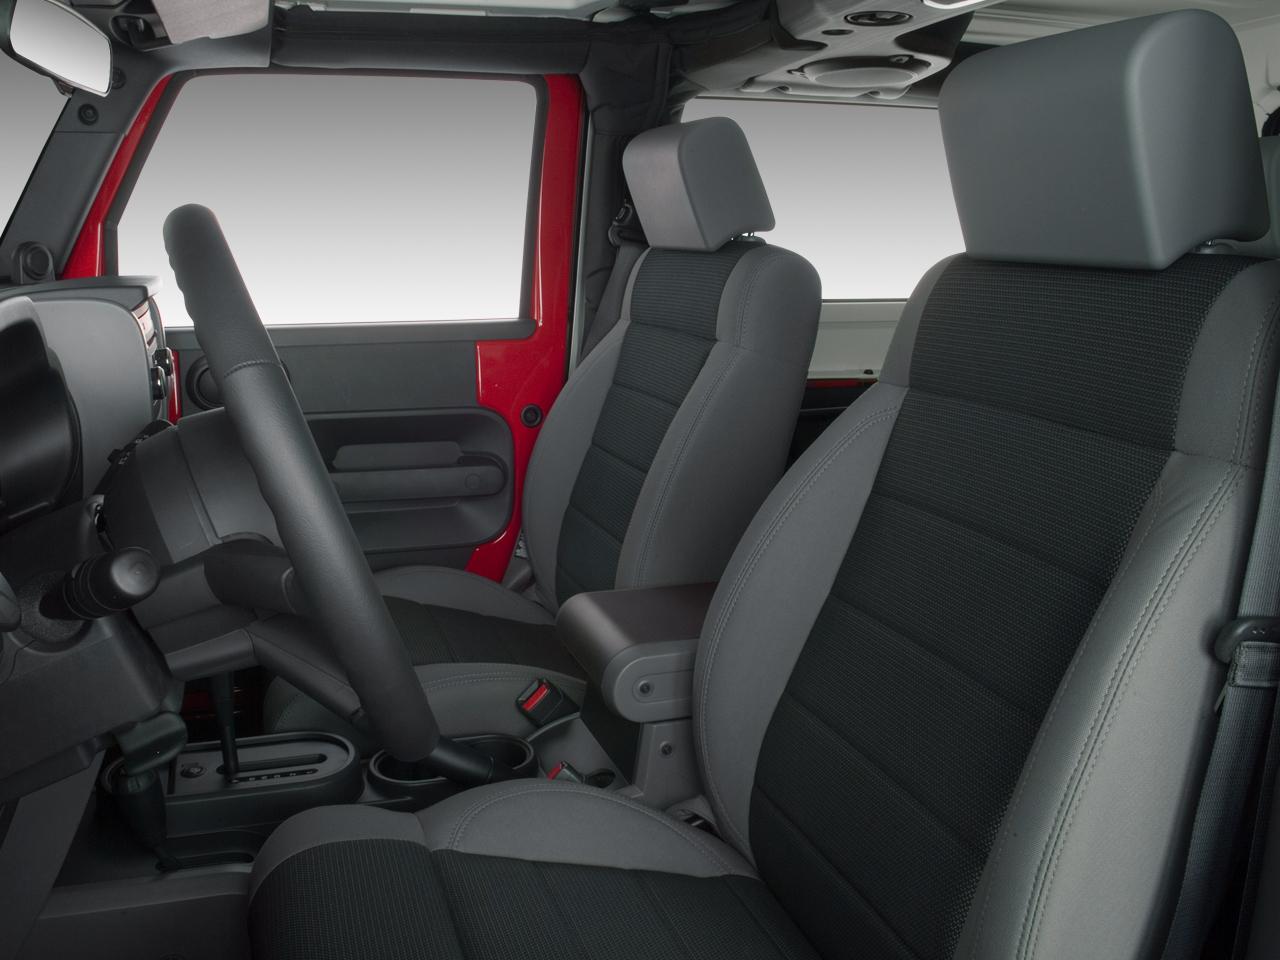 2007 jeep wrangler unlimited 2006 new york international auto show nyias automobile magazine. Black Bedroom Furniture Sets. Home Design Ideas